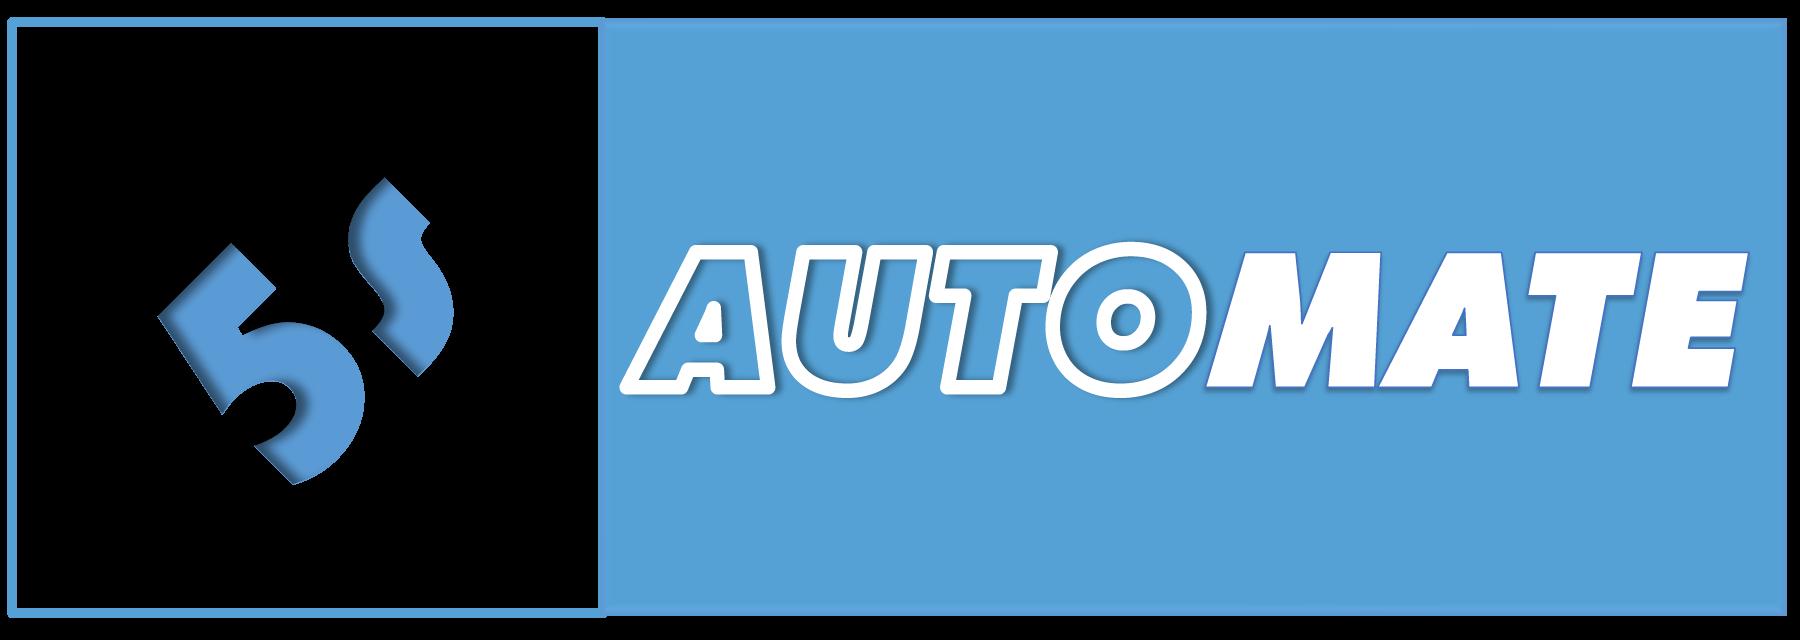 Logo of 5sAutomate